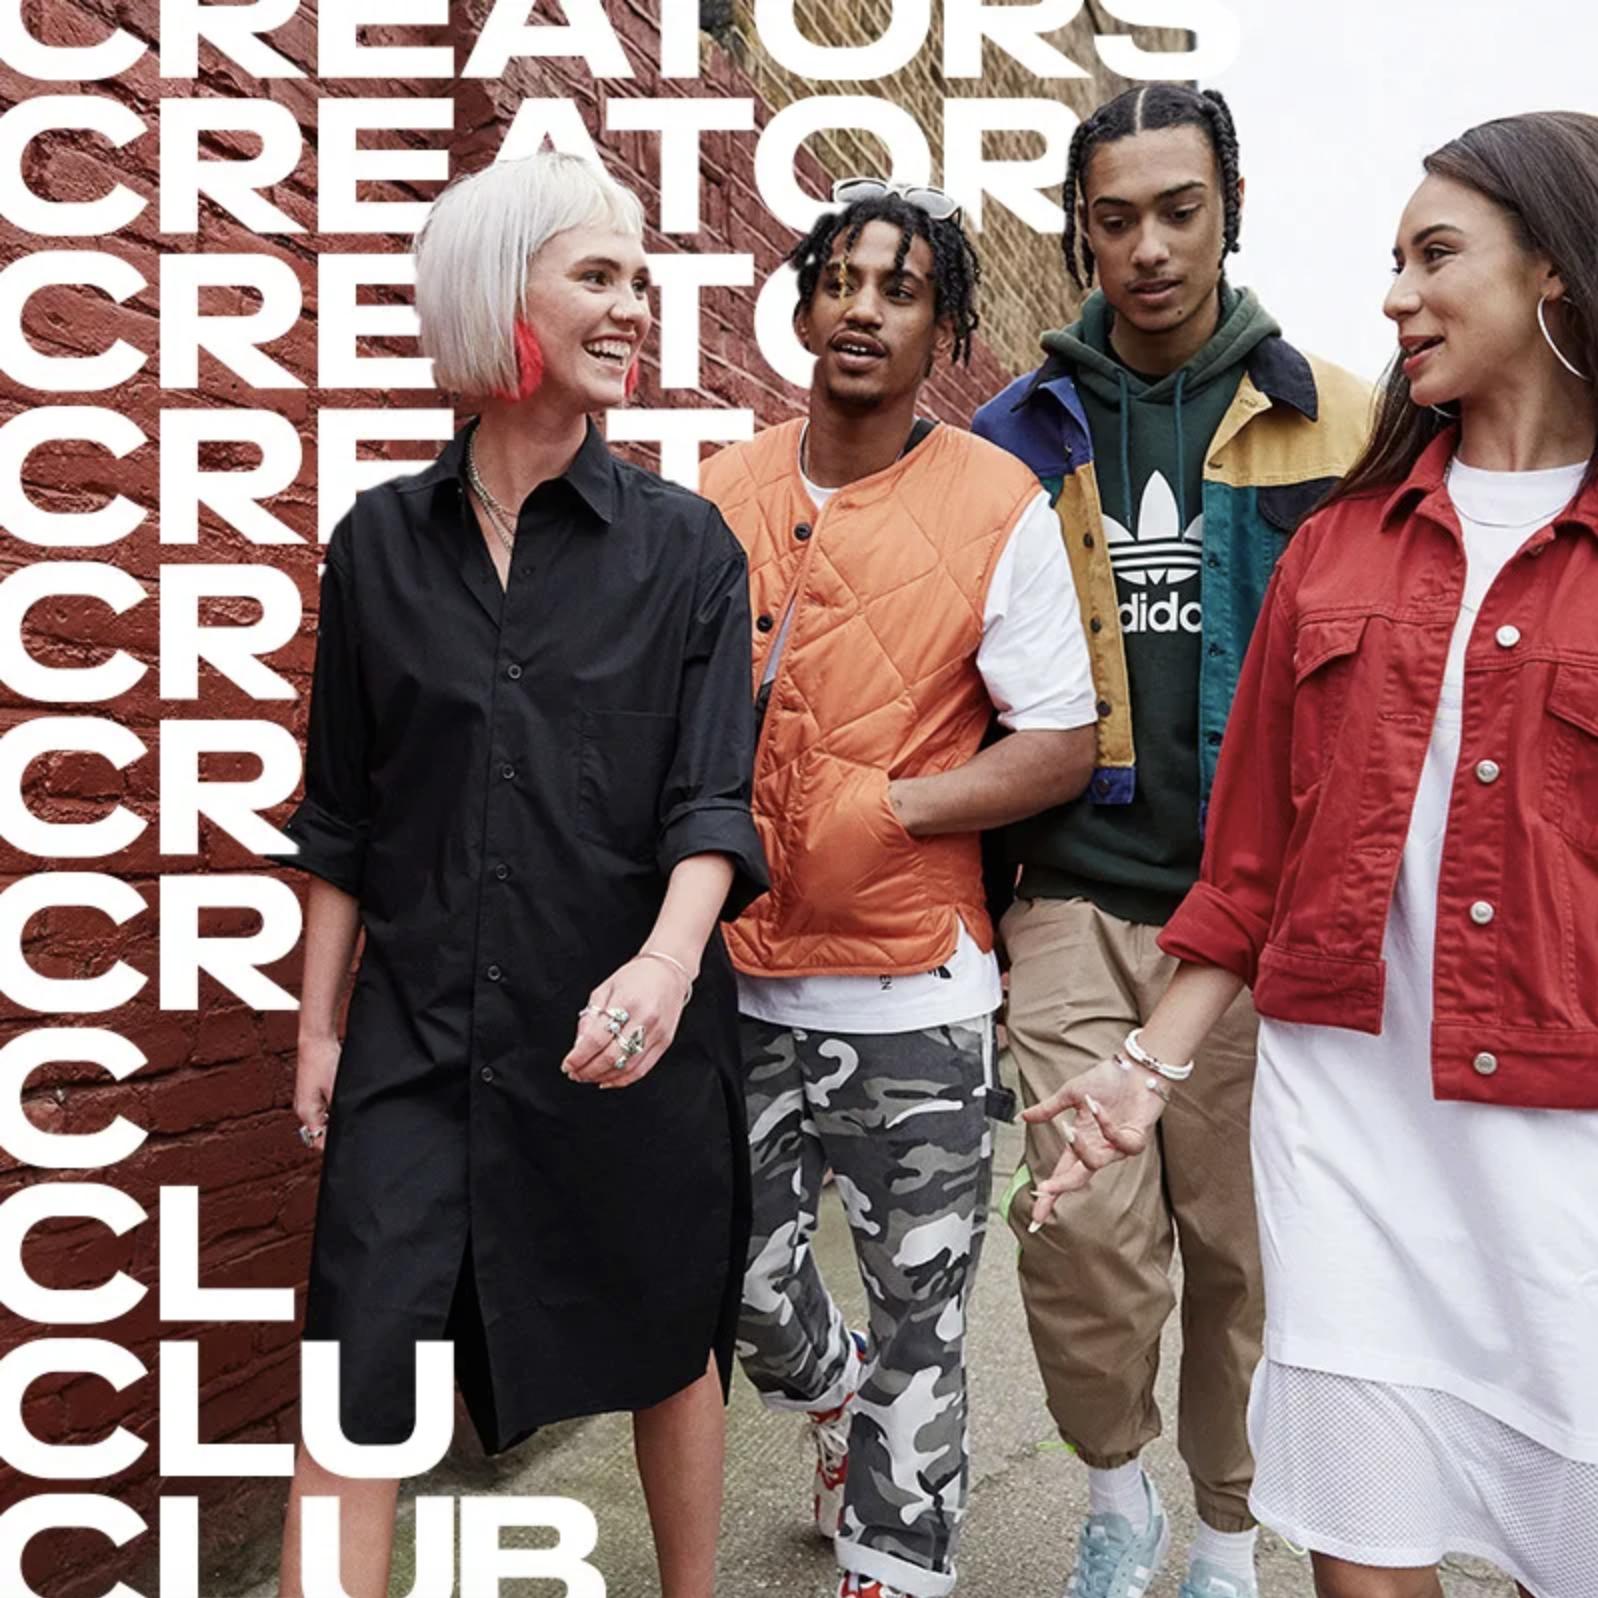 escala embotellamiento cuello  Paul Mann—adidas   Creators Club